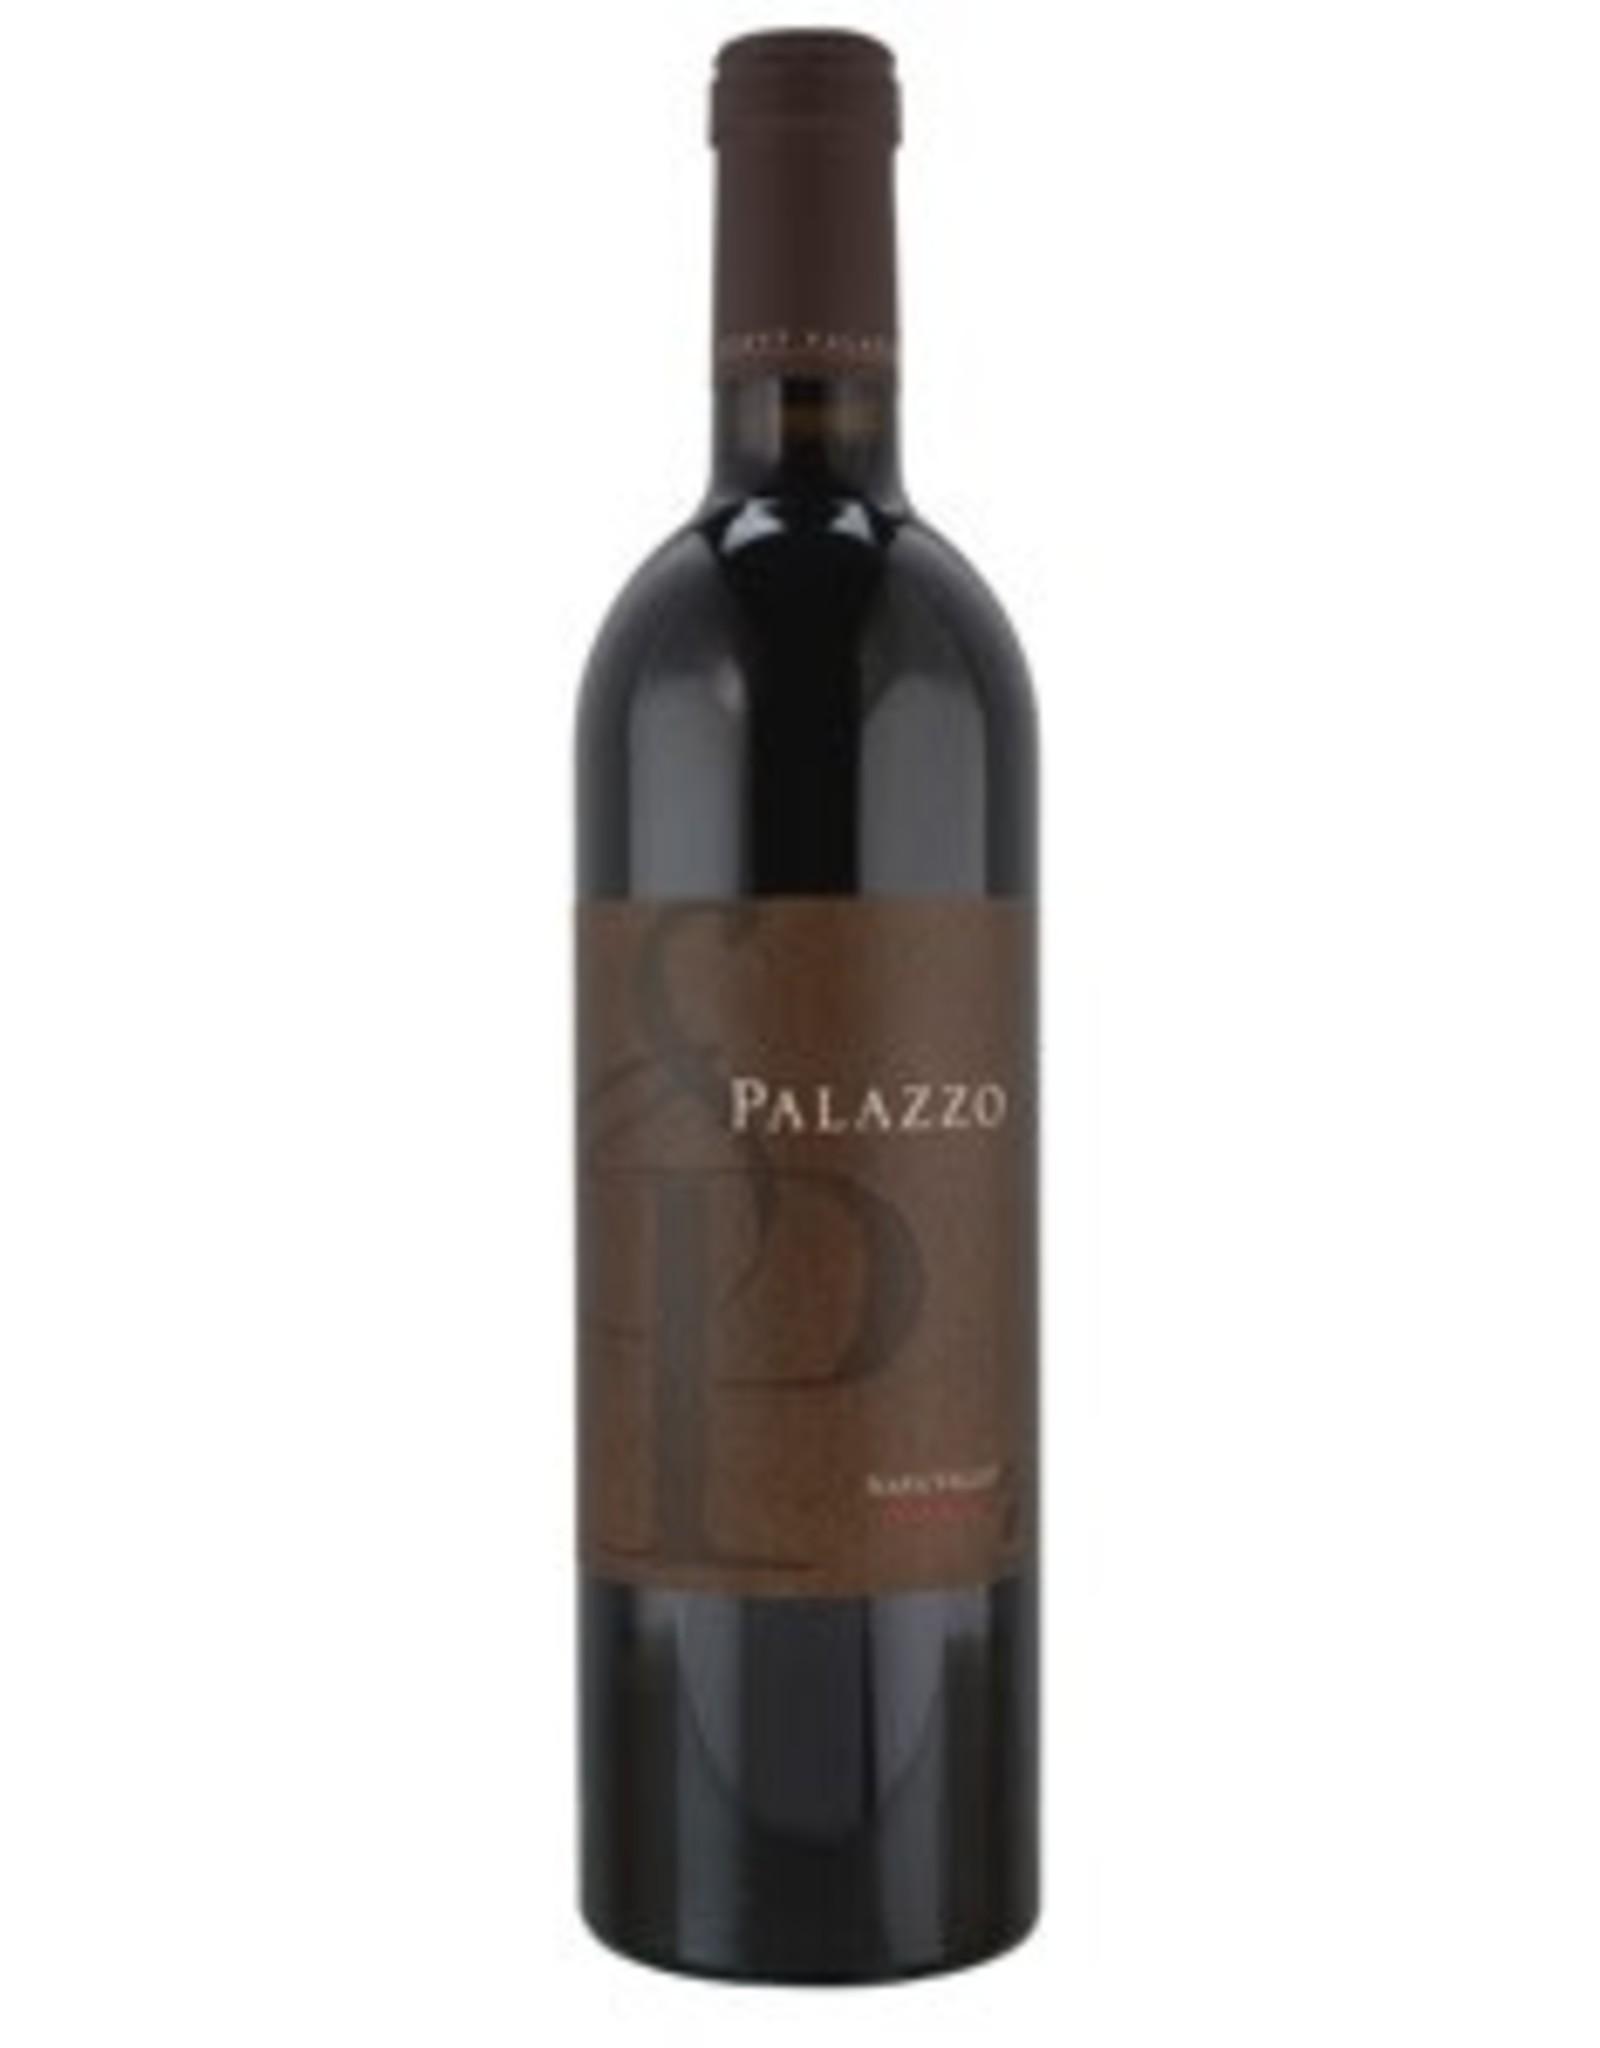 PALAZZO 2006 750ML